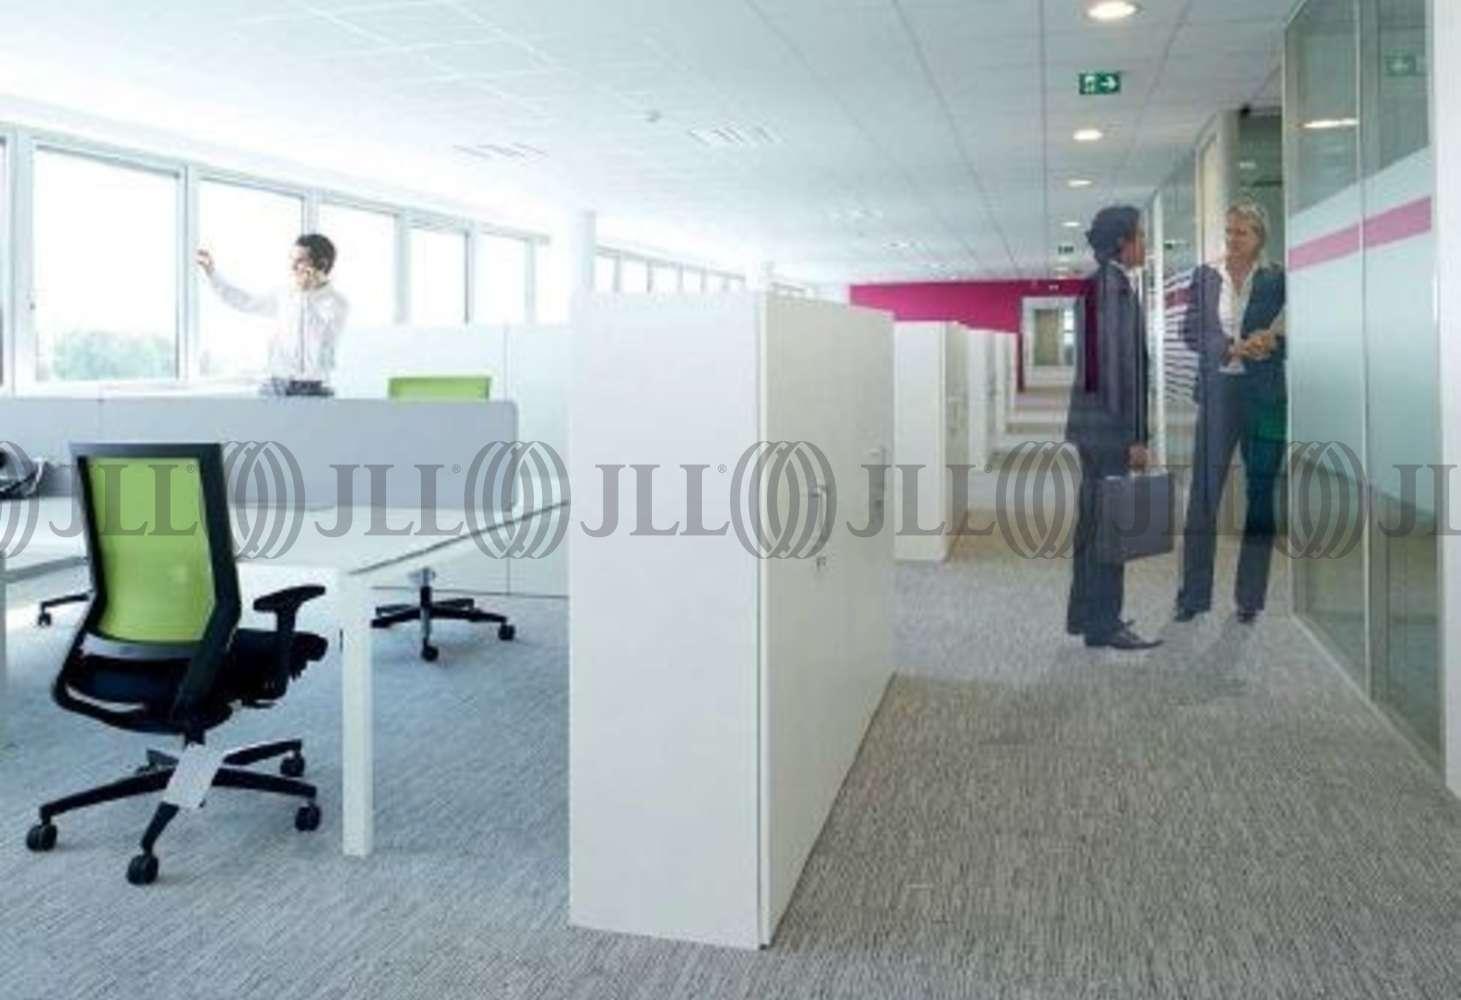 Bureaux Vaulx milieu, 38090 - INNOVA PARK - LOCATION BUREAUX